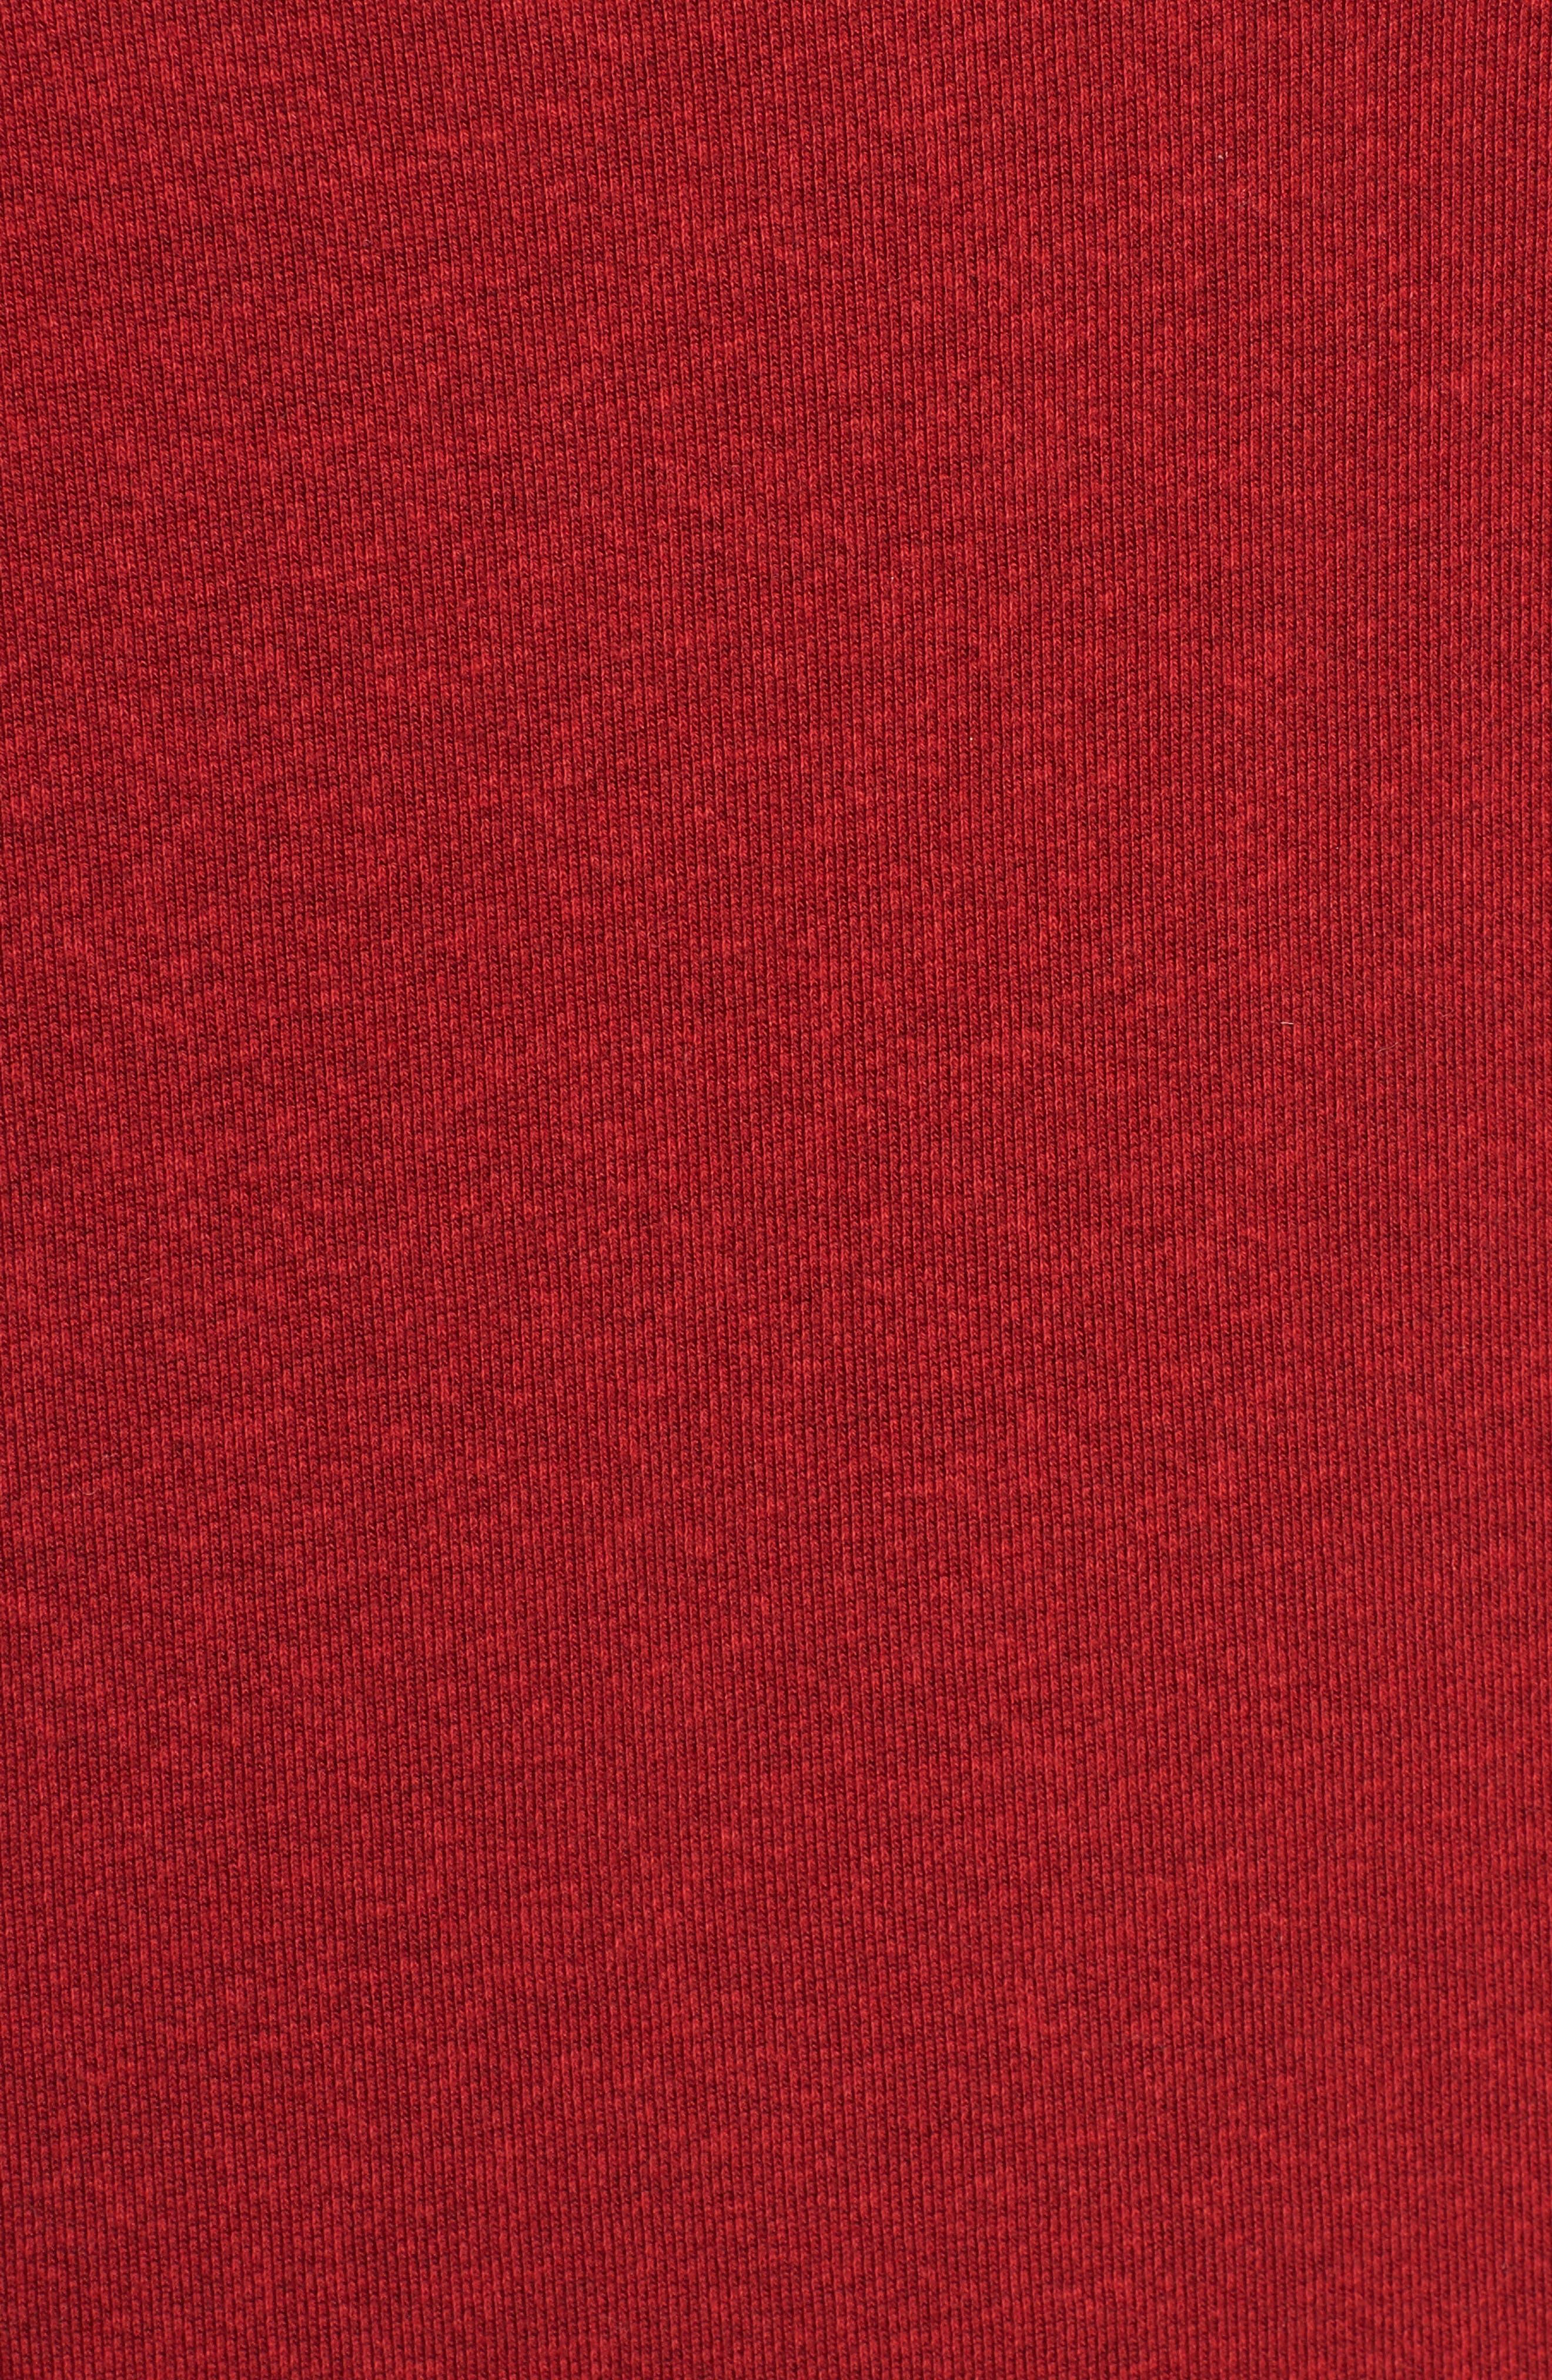 Alternate Image 5  - Sundry Sleigh All Day Sweatshirt (Nordstrom Exclusive)